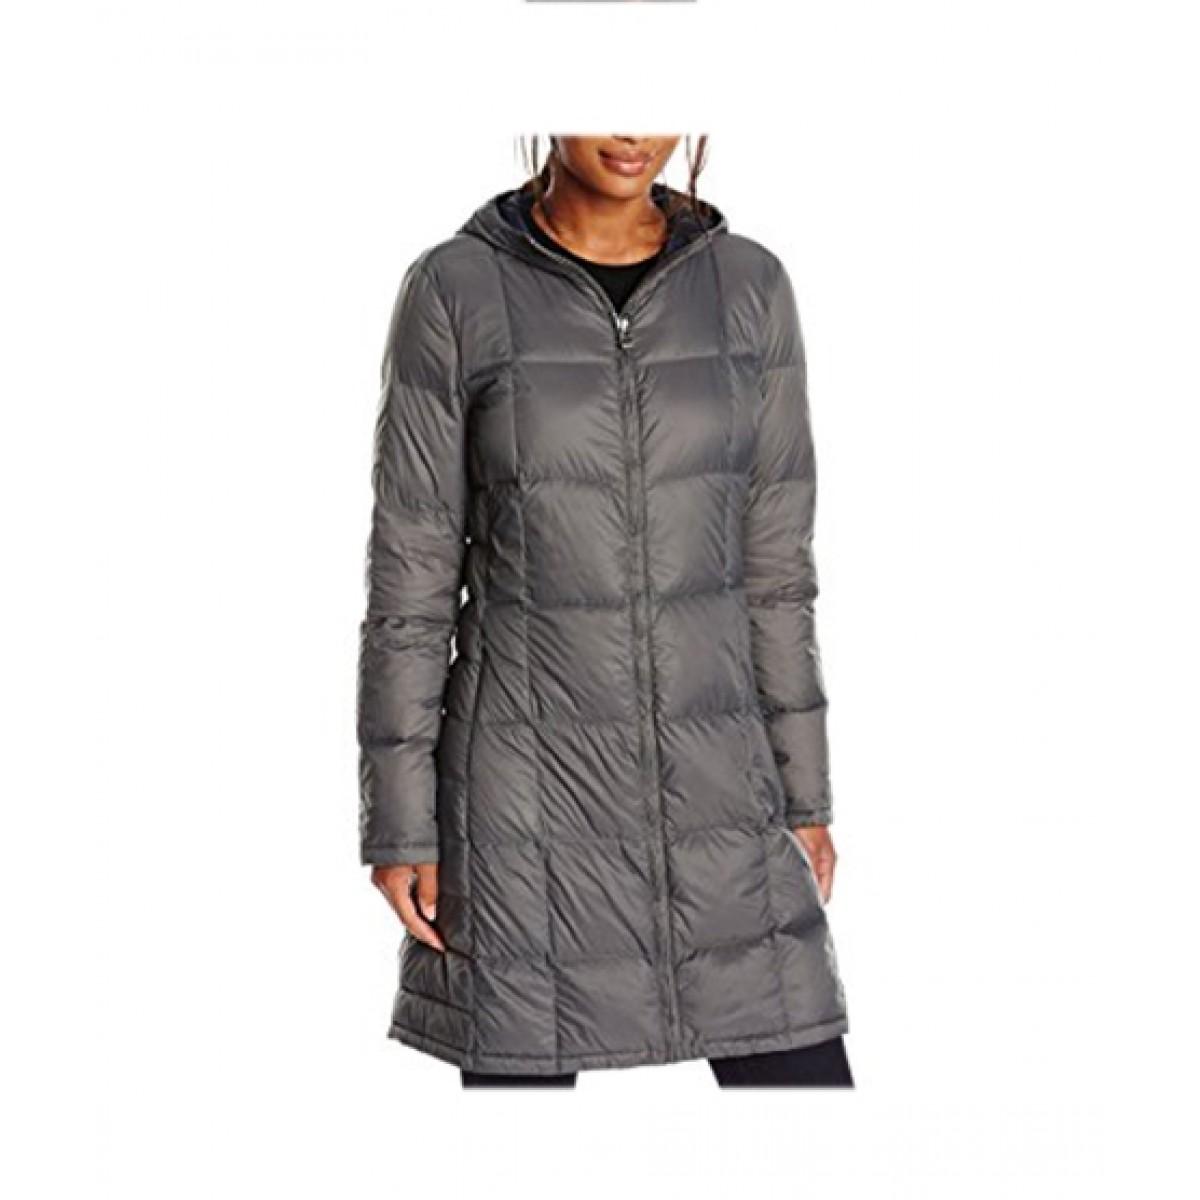 c17c28d71e8 Tommy Hilfiger Classic Women Coat Price in Pakistan | Buy Tommy Hilfiger  Classic Chevron Down Women's Coat Titan (TW5MD166) | iShopping.pk